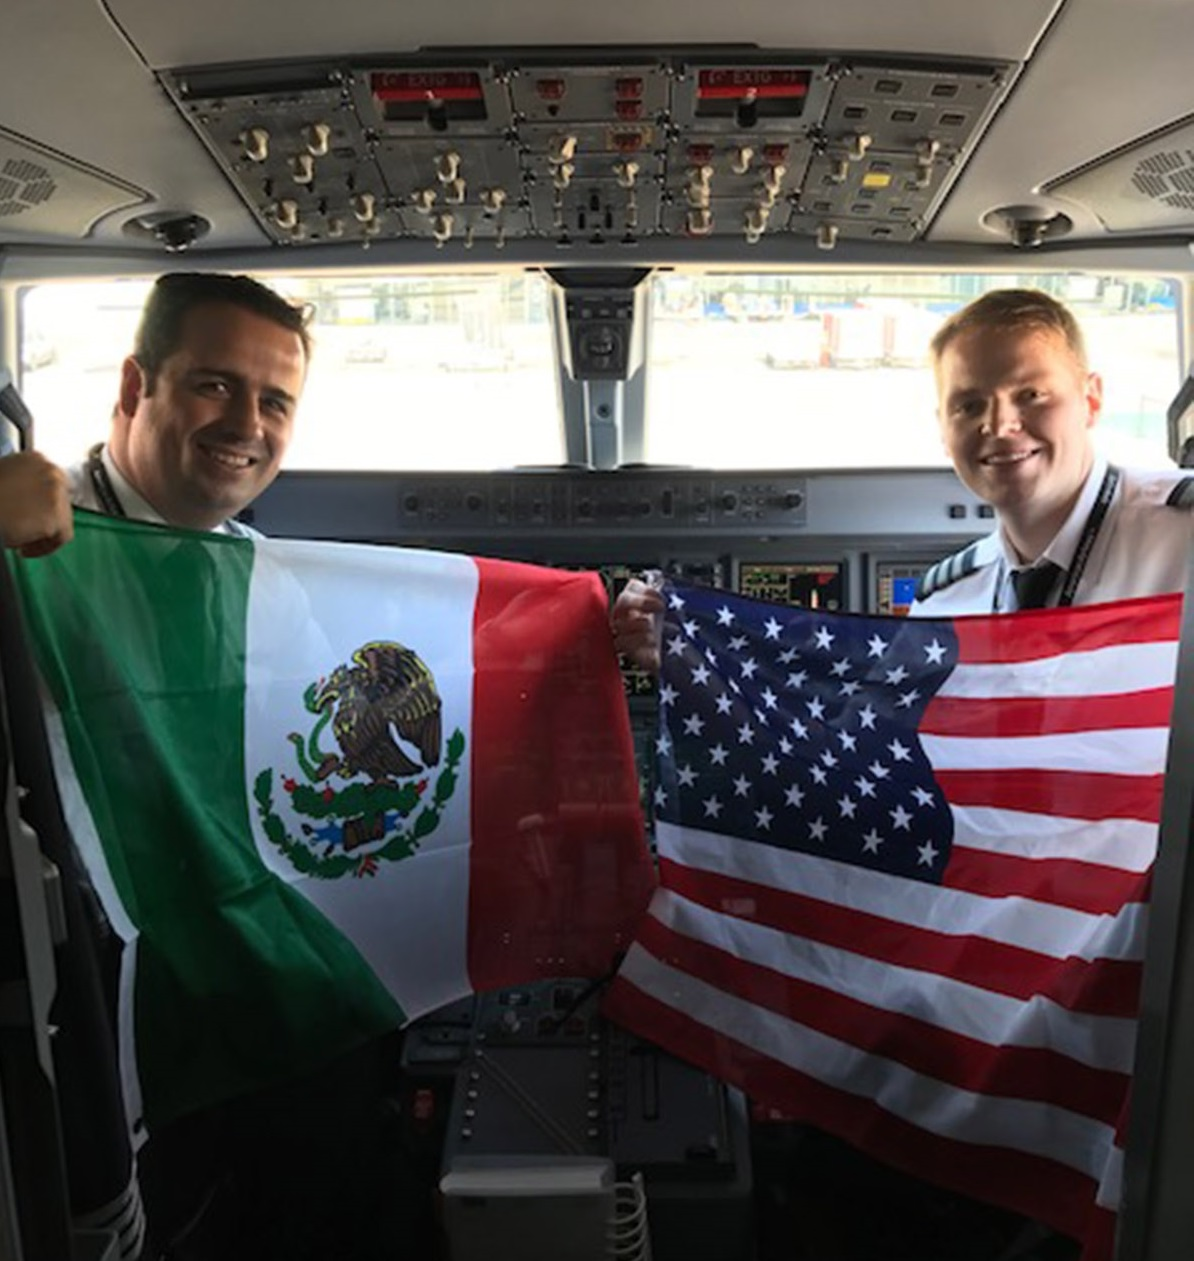 AMERICAN AIRLINES INICIA OPERACIONES ACAPULCO HUATULCO 01